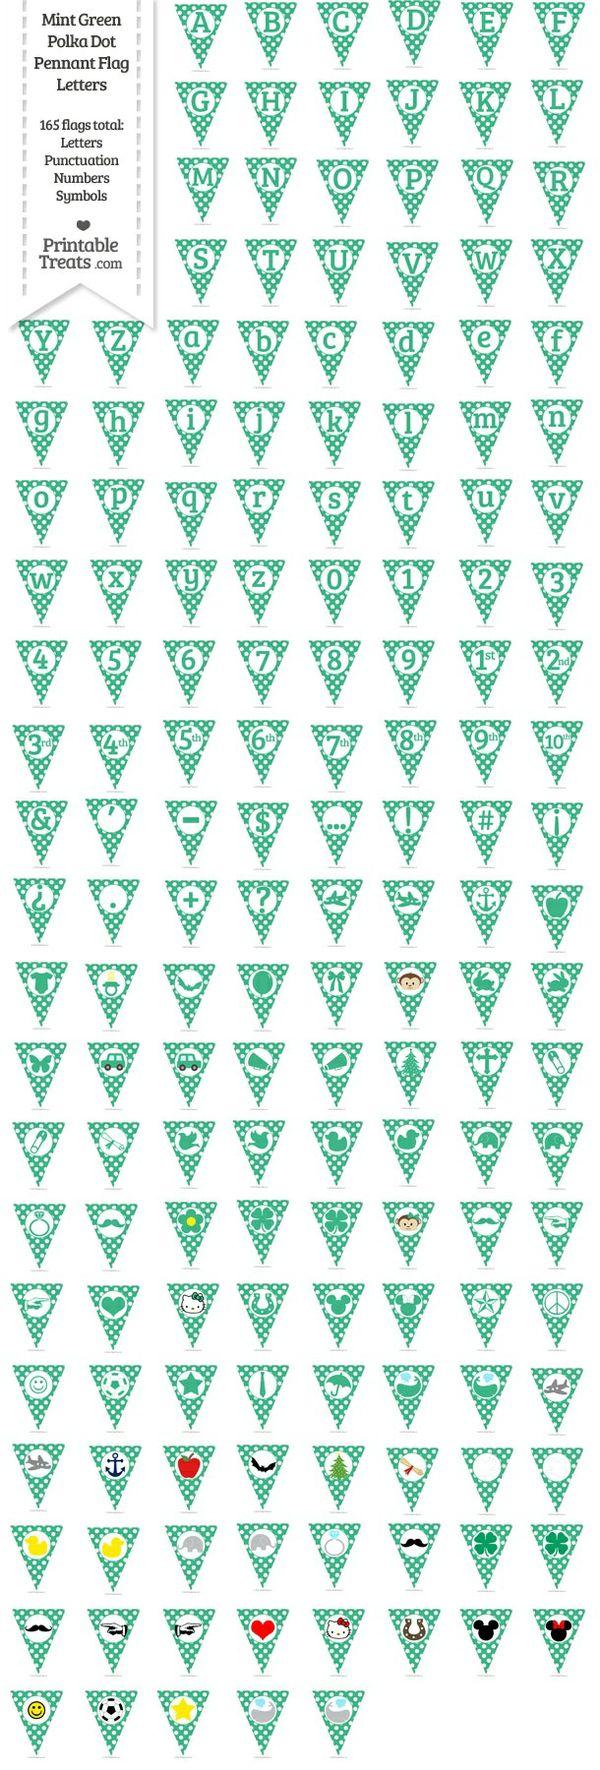 165 Mint Green Polka Dot Pennant Flag Letters Password